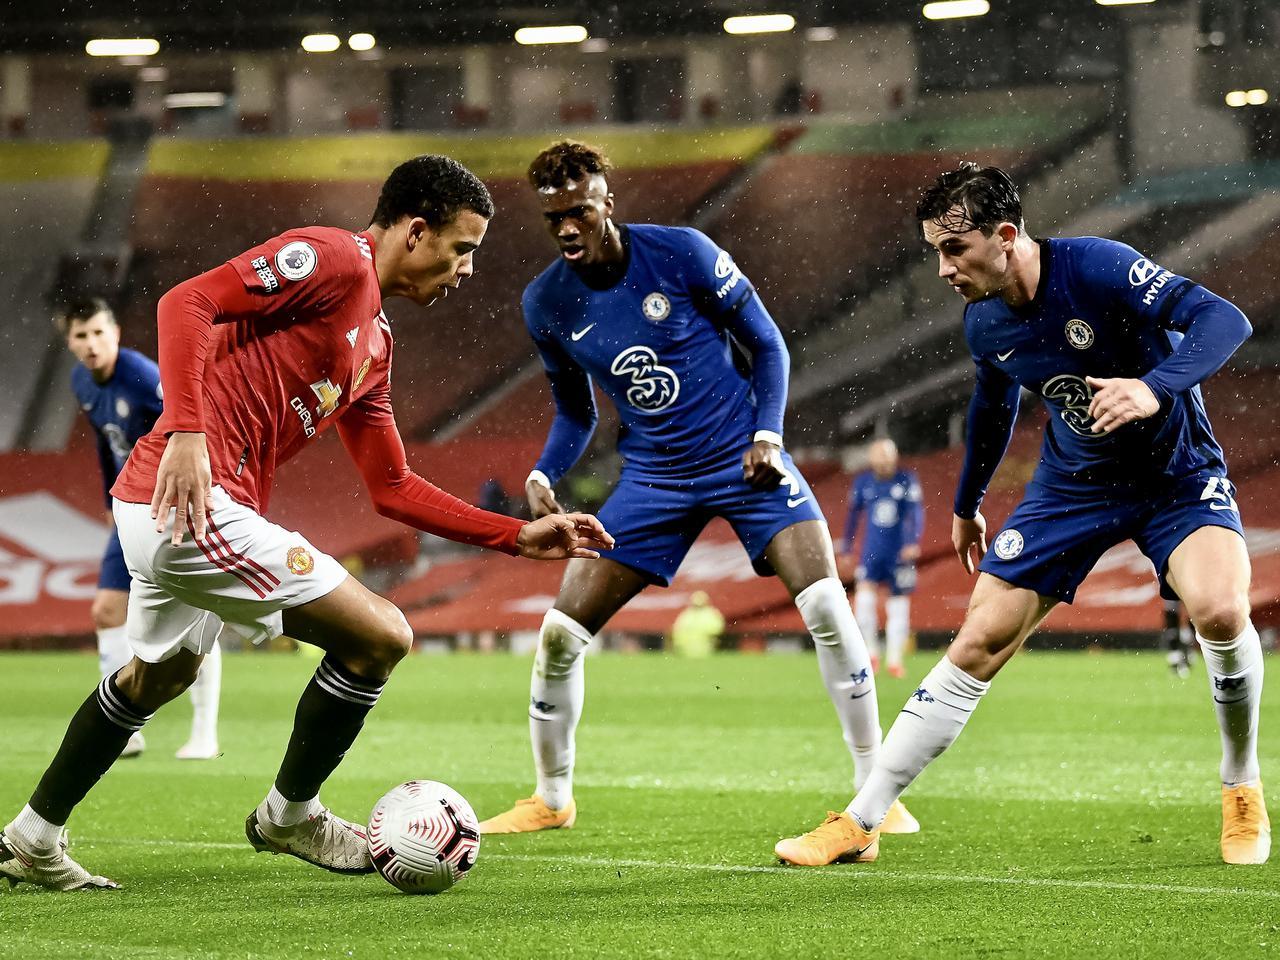 Man Utd v Chelsea Premier League match report 24 October 2020